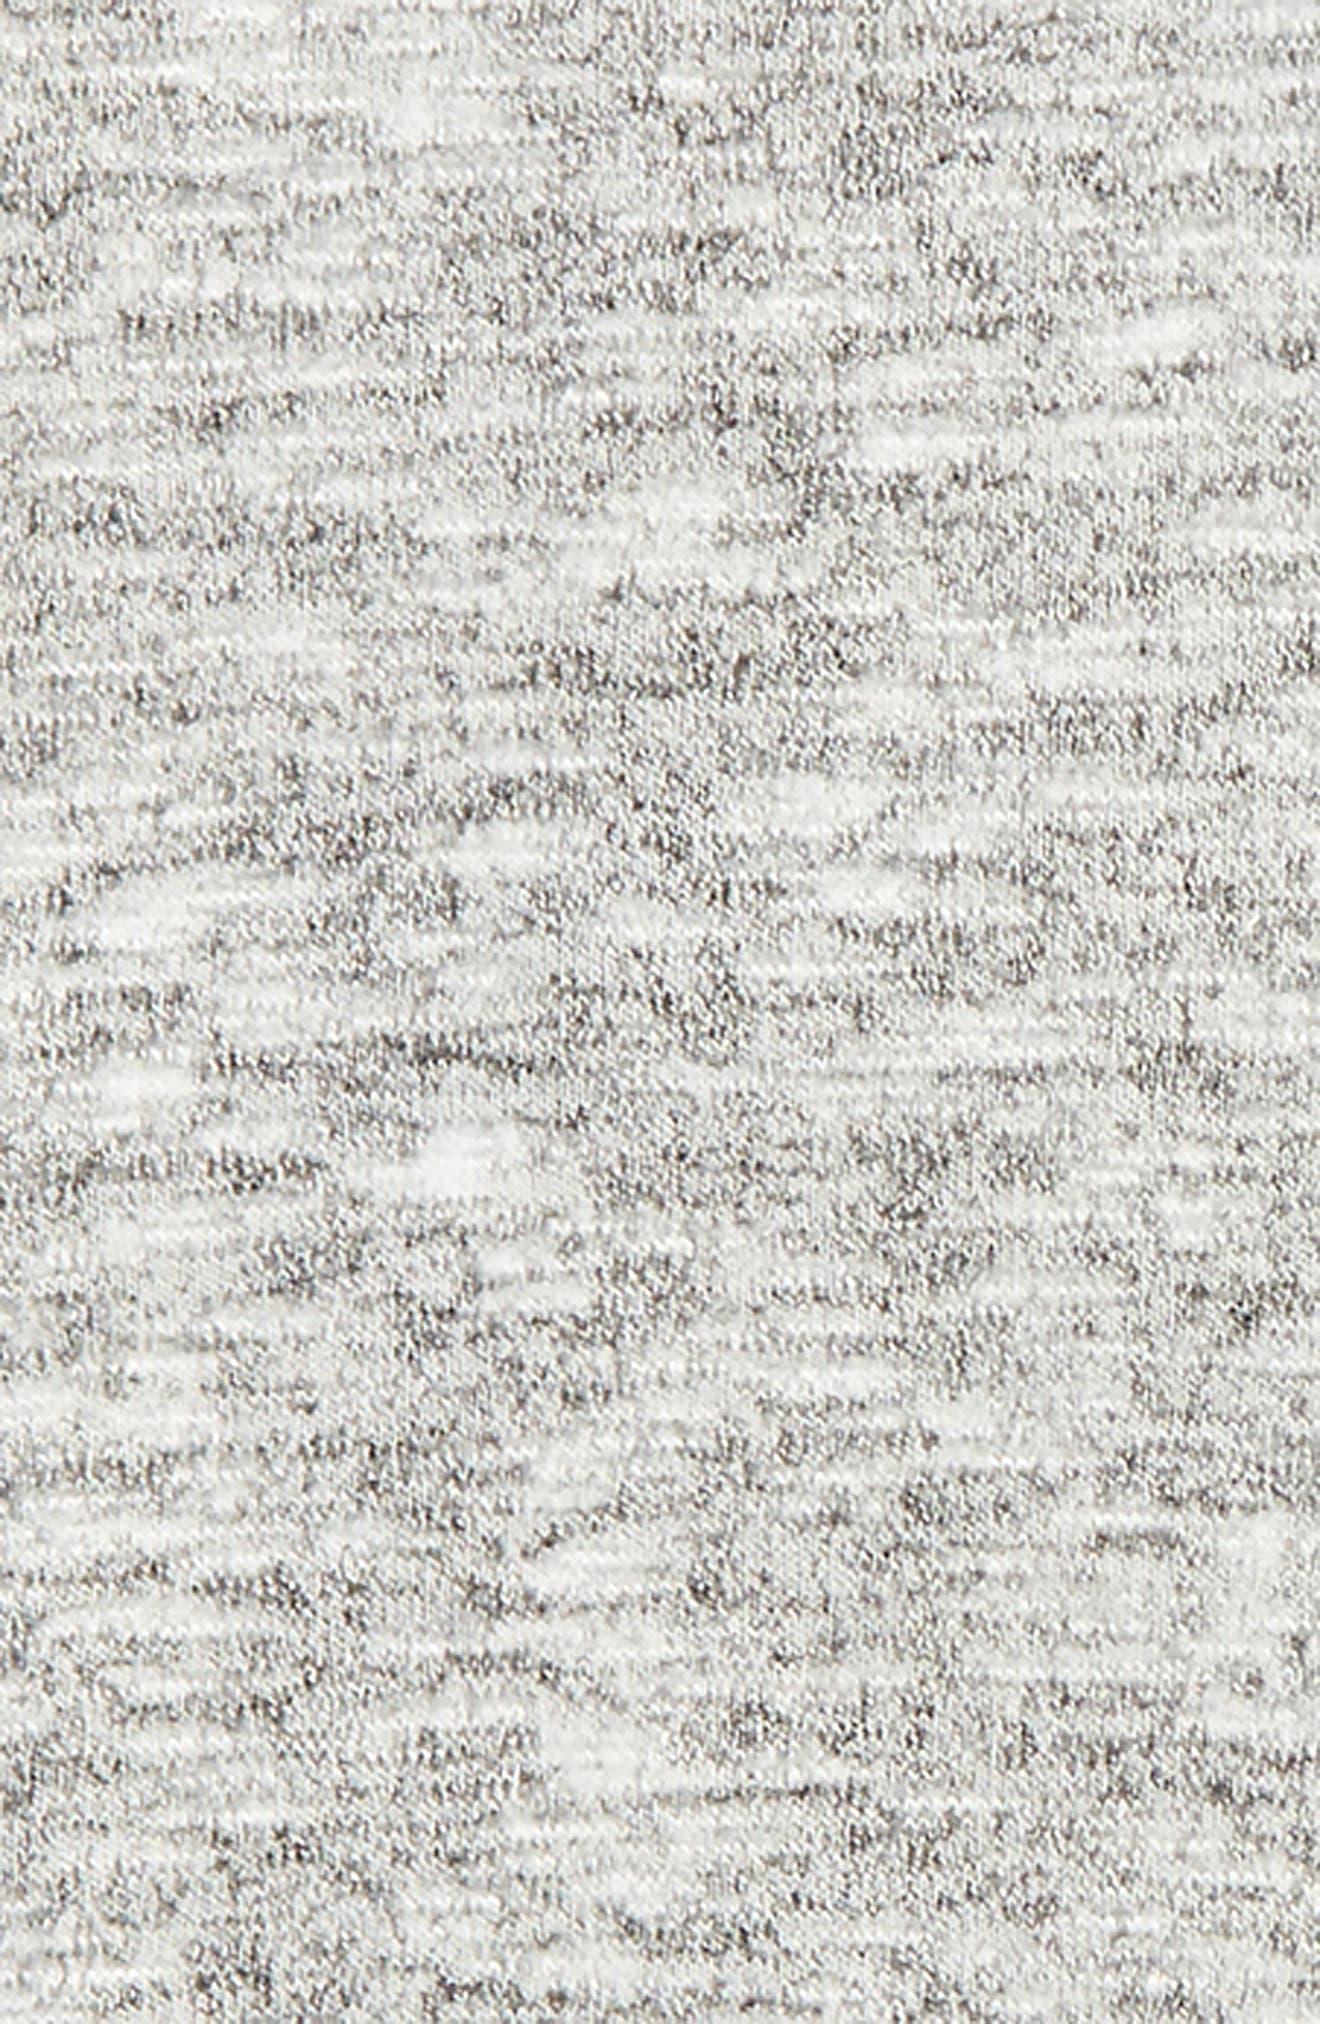 Vinyasa Cutout Hooded Pullover,                             Alternate thumbnail 3, color,                             001